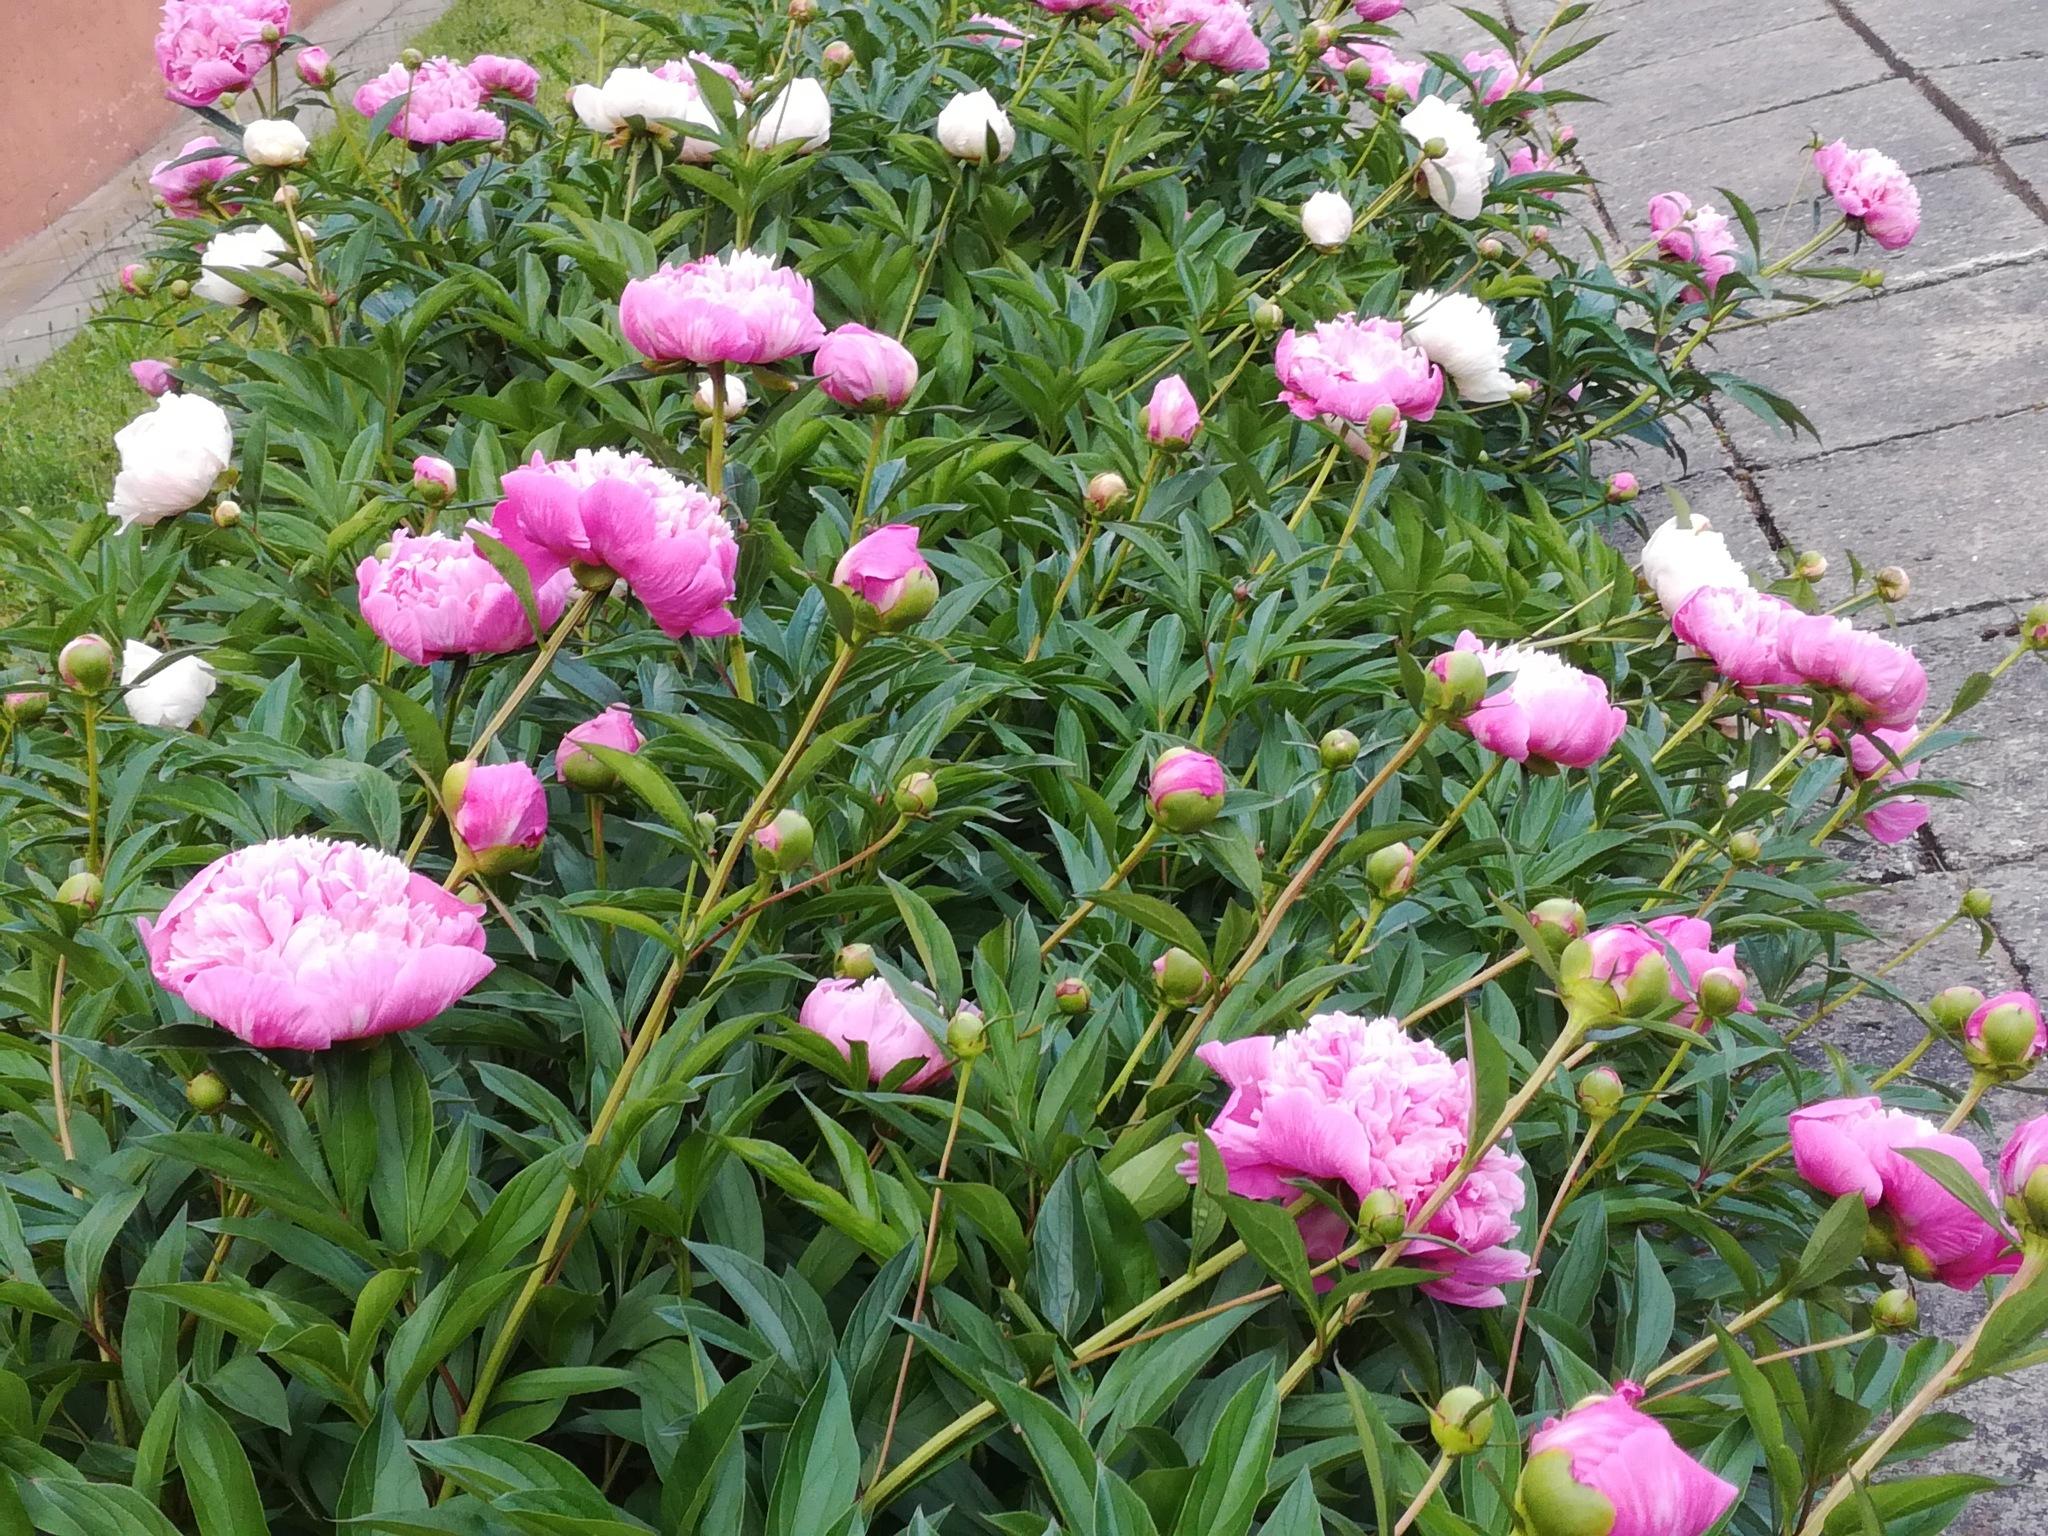 It was in spring by uzkuraitiene62